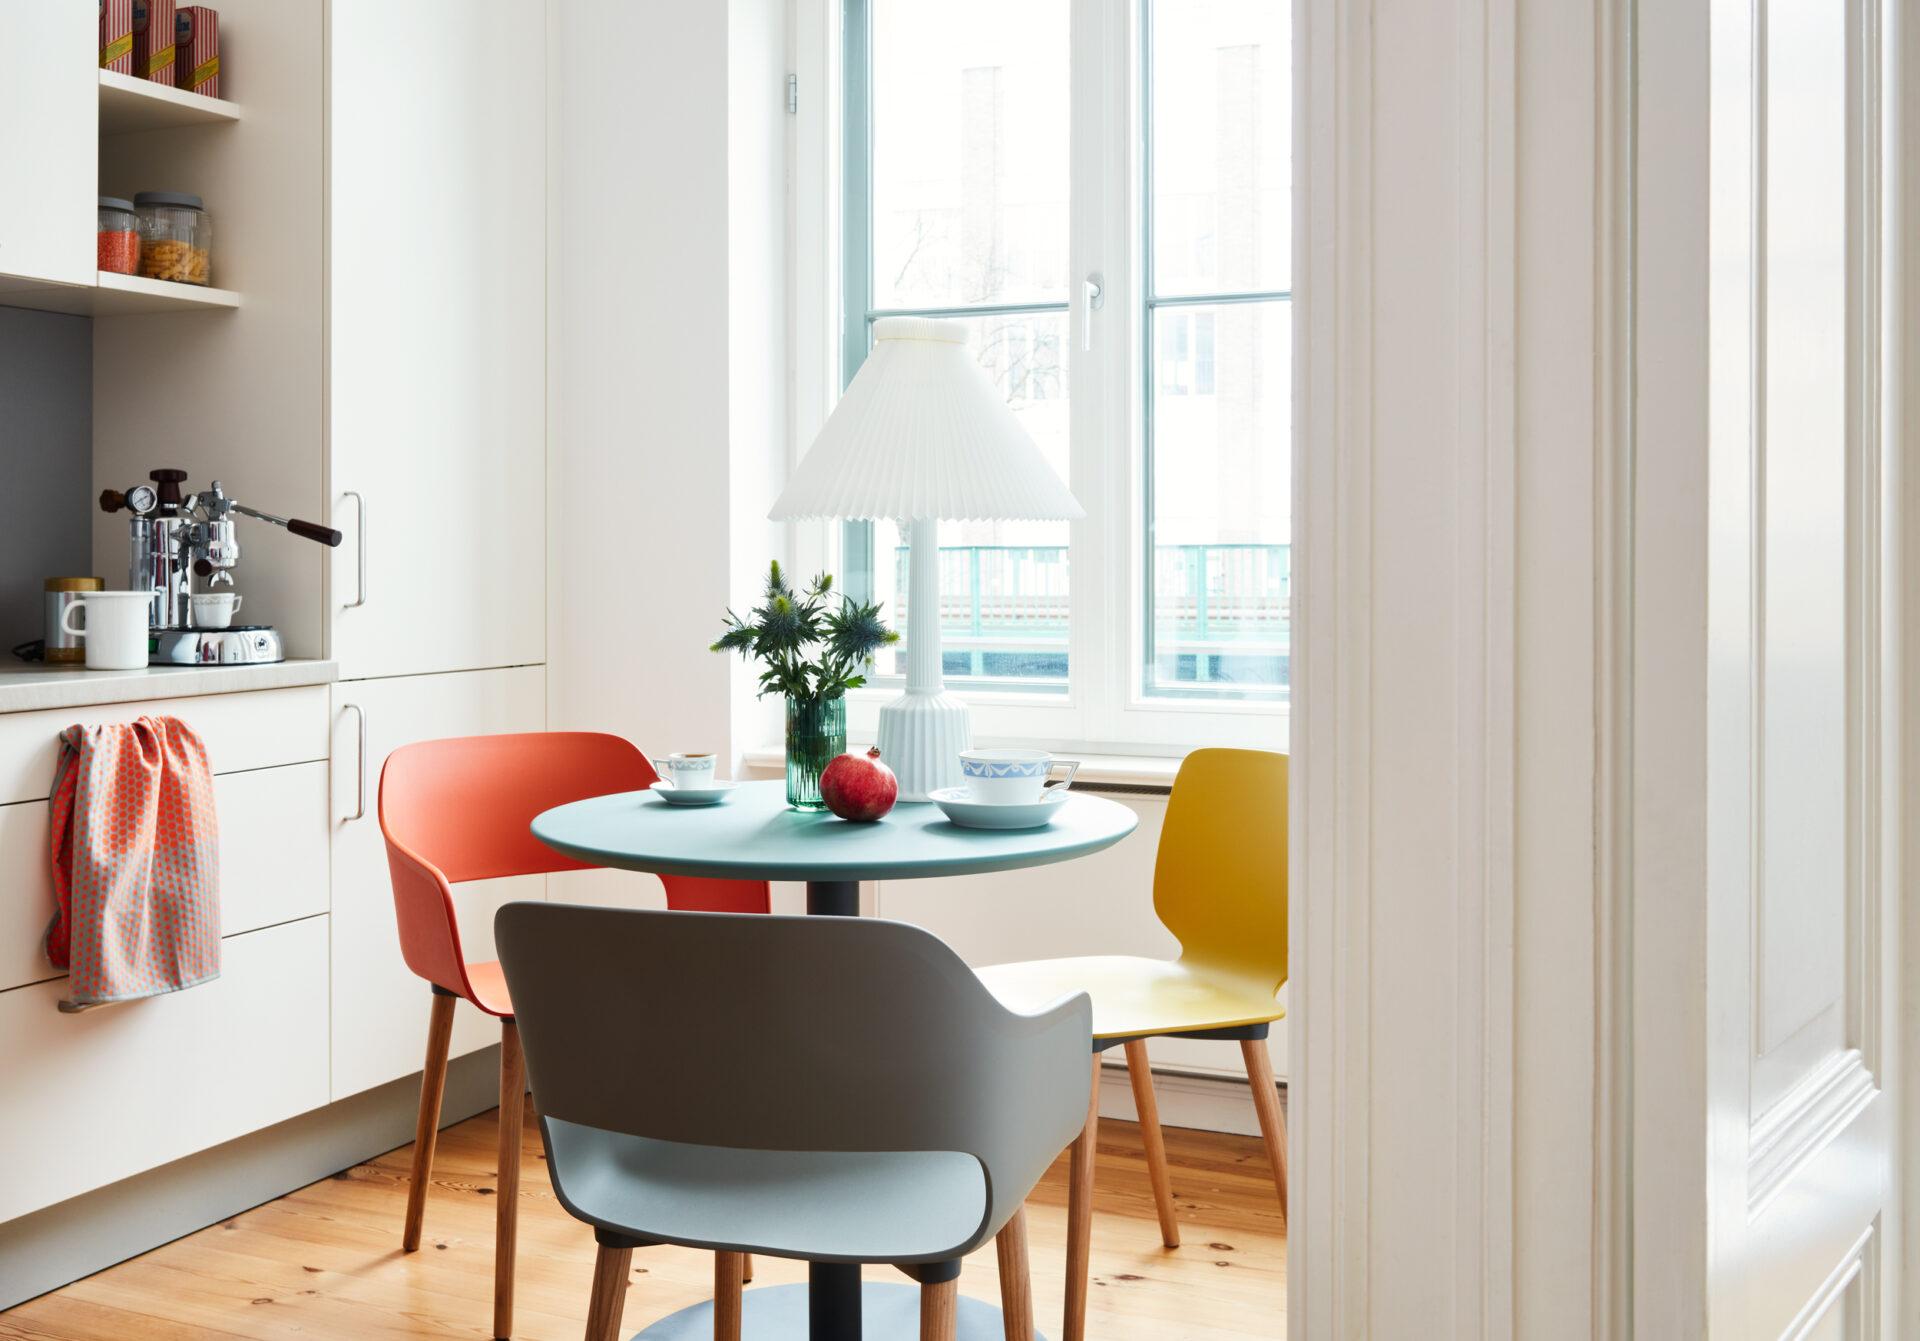 Antonius Schimmelbusch_Apartment Berlin_Ragnar Schmuck_David Borck_06